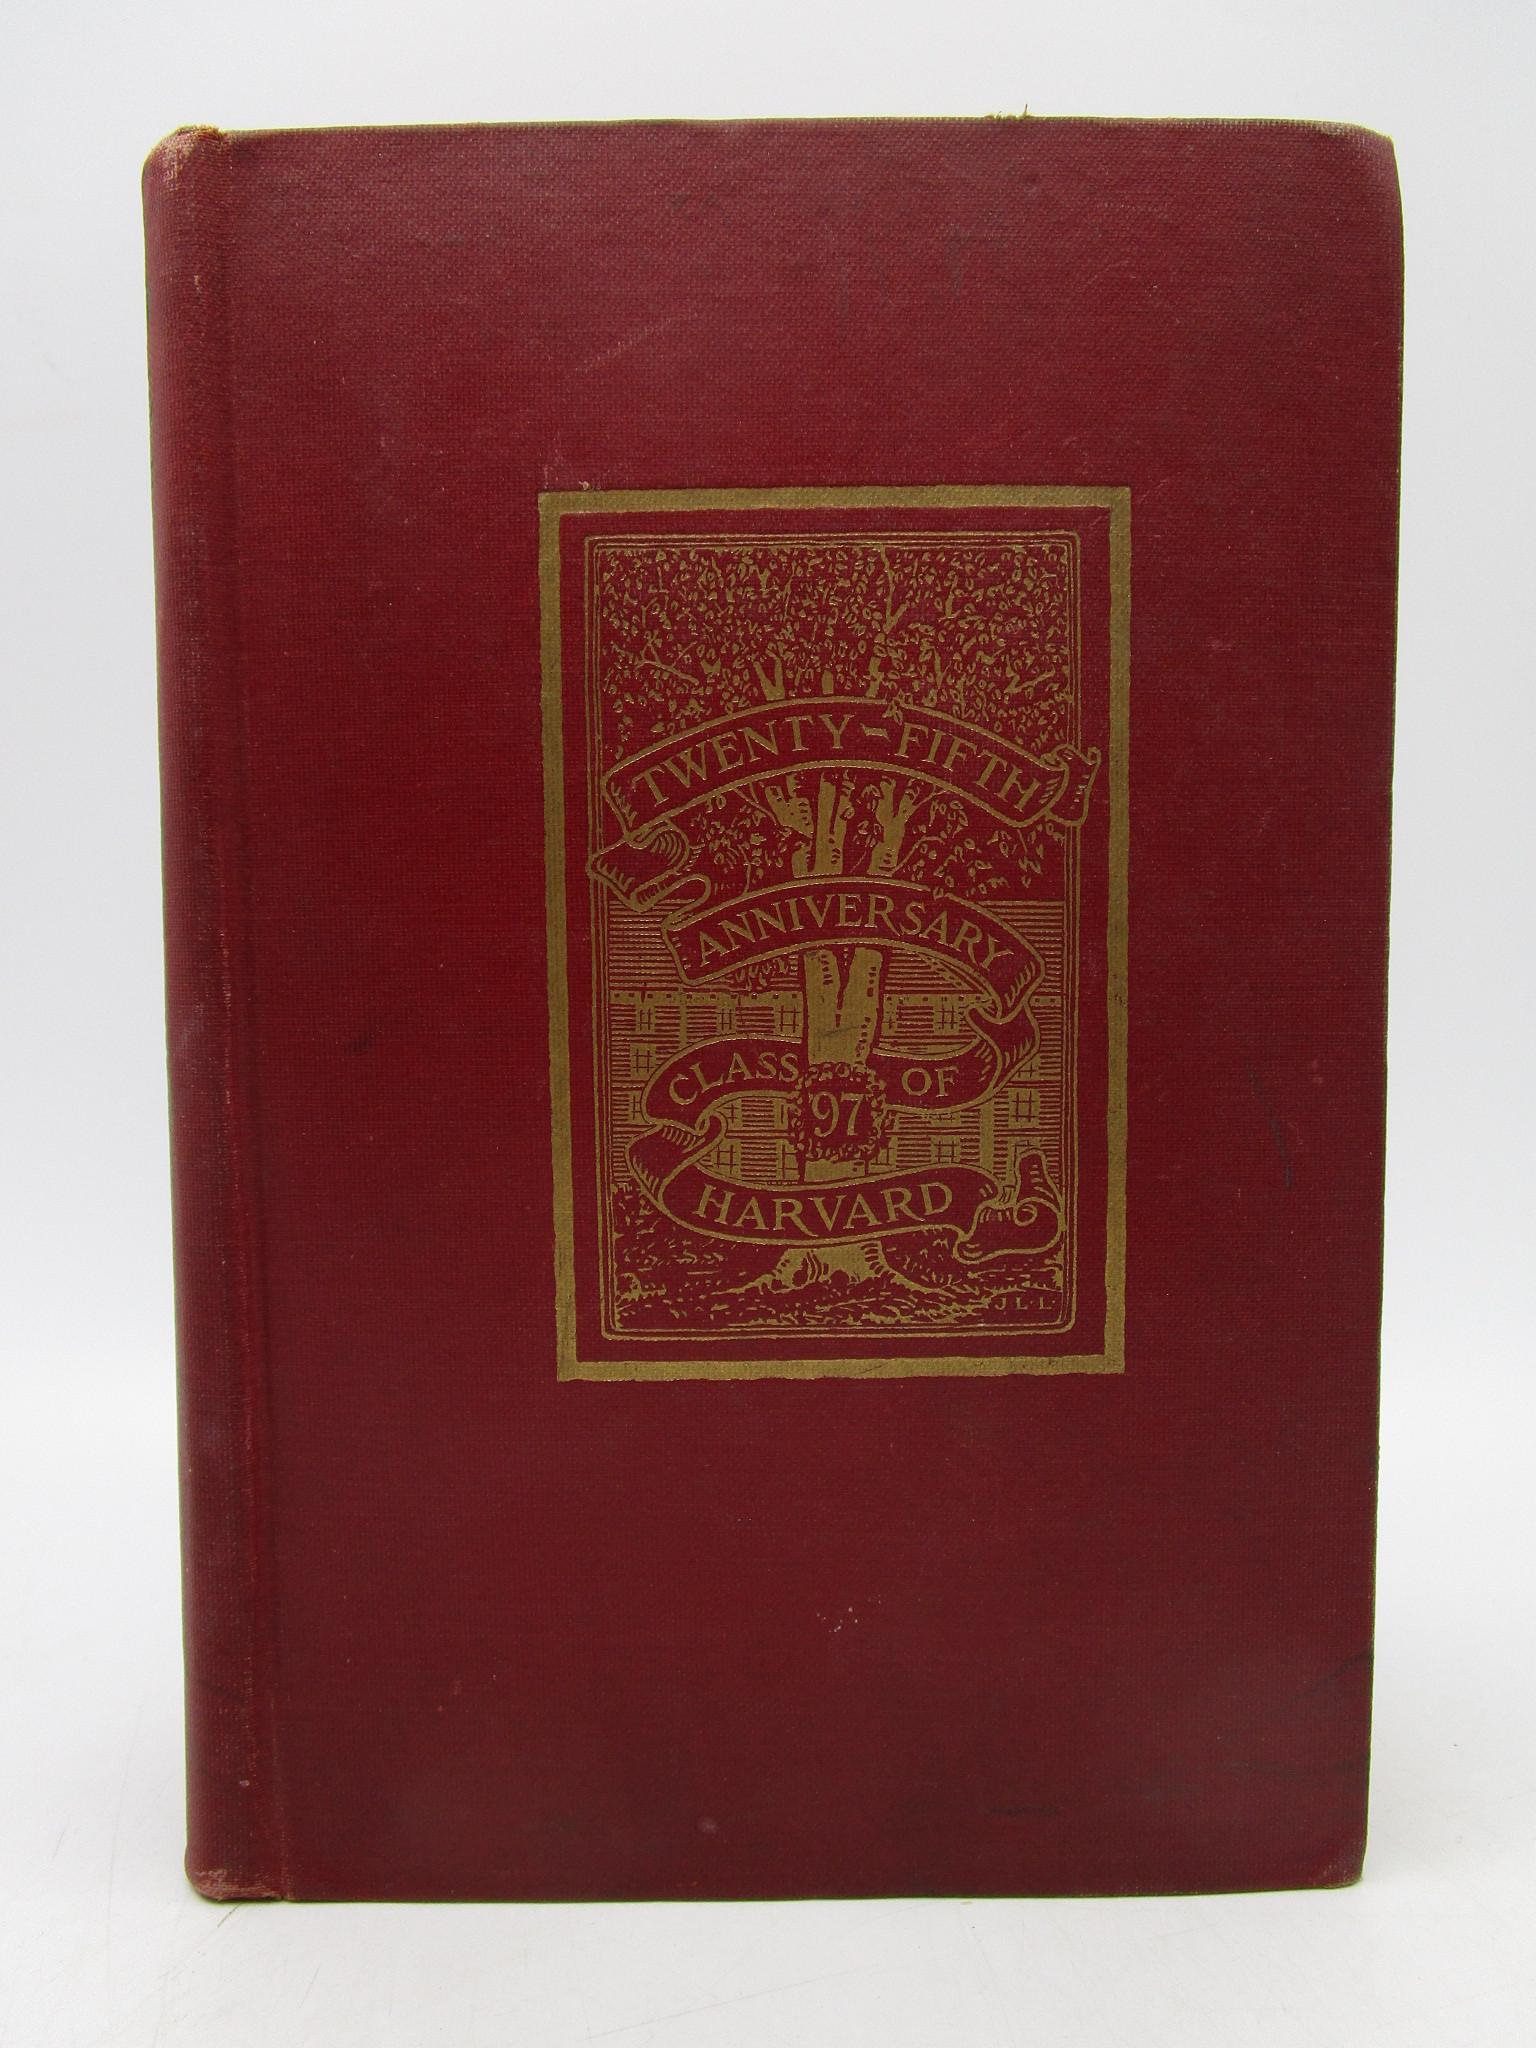 Image for Harvard College Class of 1897: Twenty-fifth Anniversary Report 1897-1922